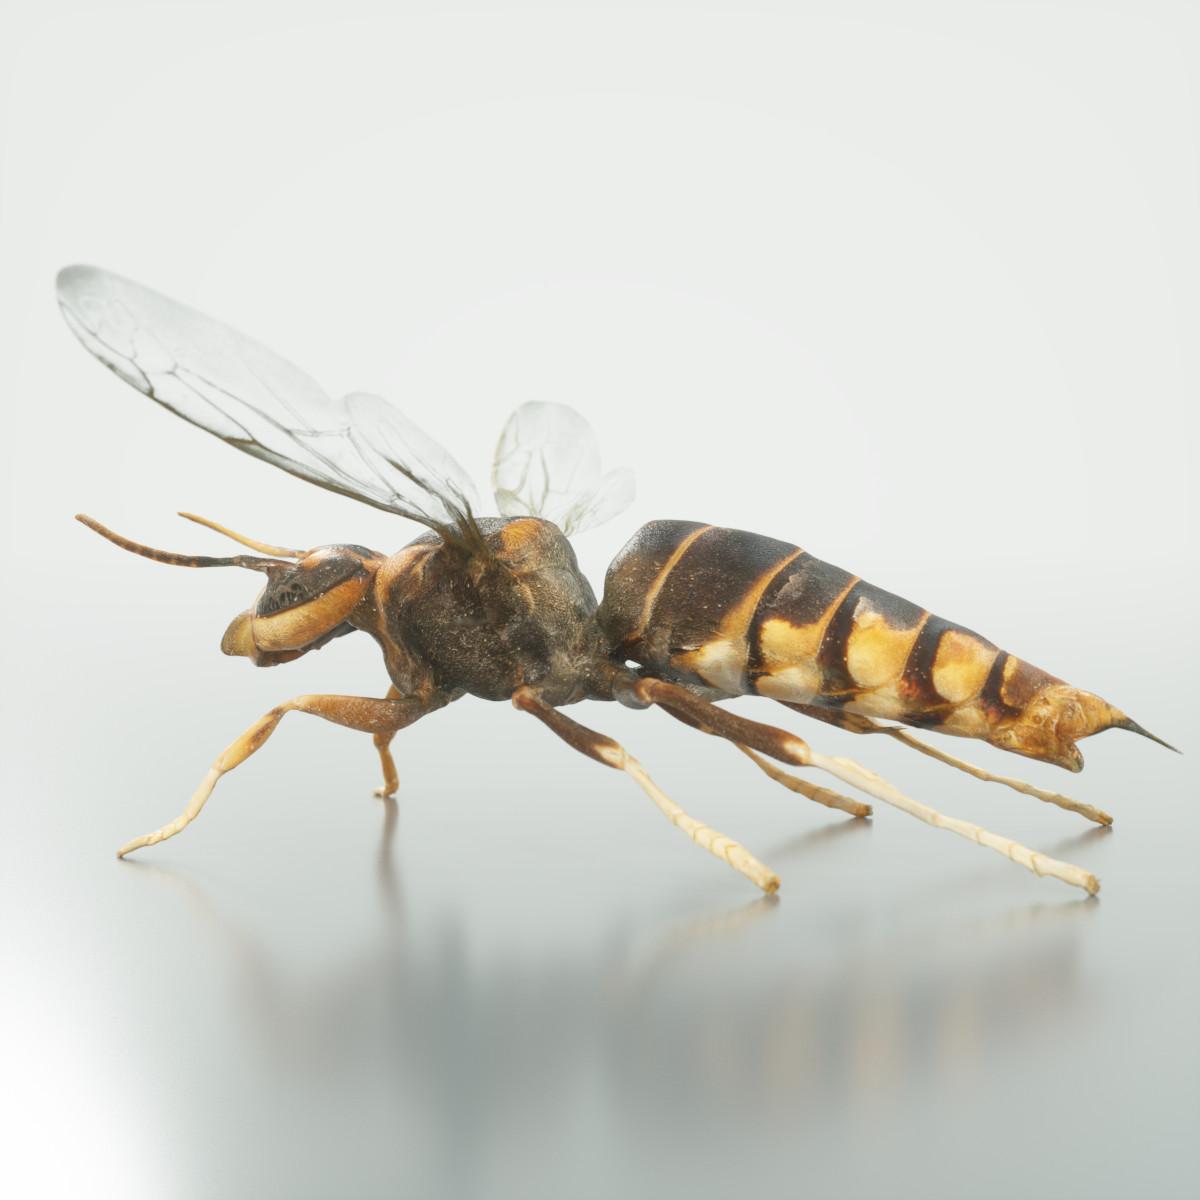 Vespa_Velutina_Variana_Wasp_3D-Model_Scan_Mark_Florquin_3D_Model_Render-5.png